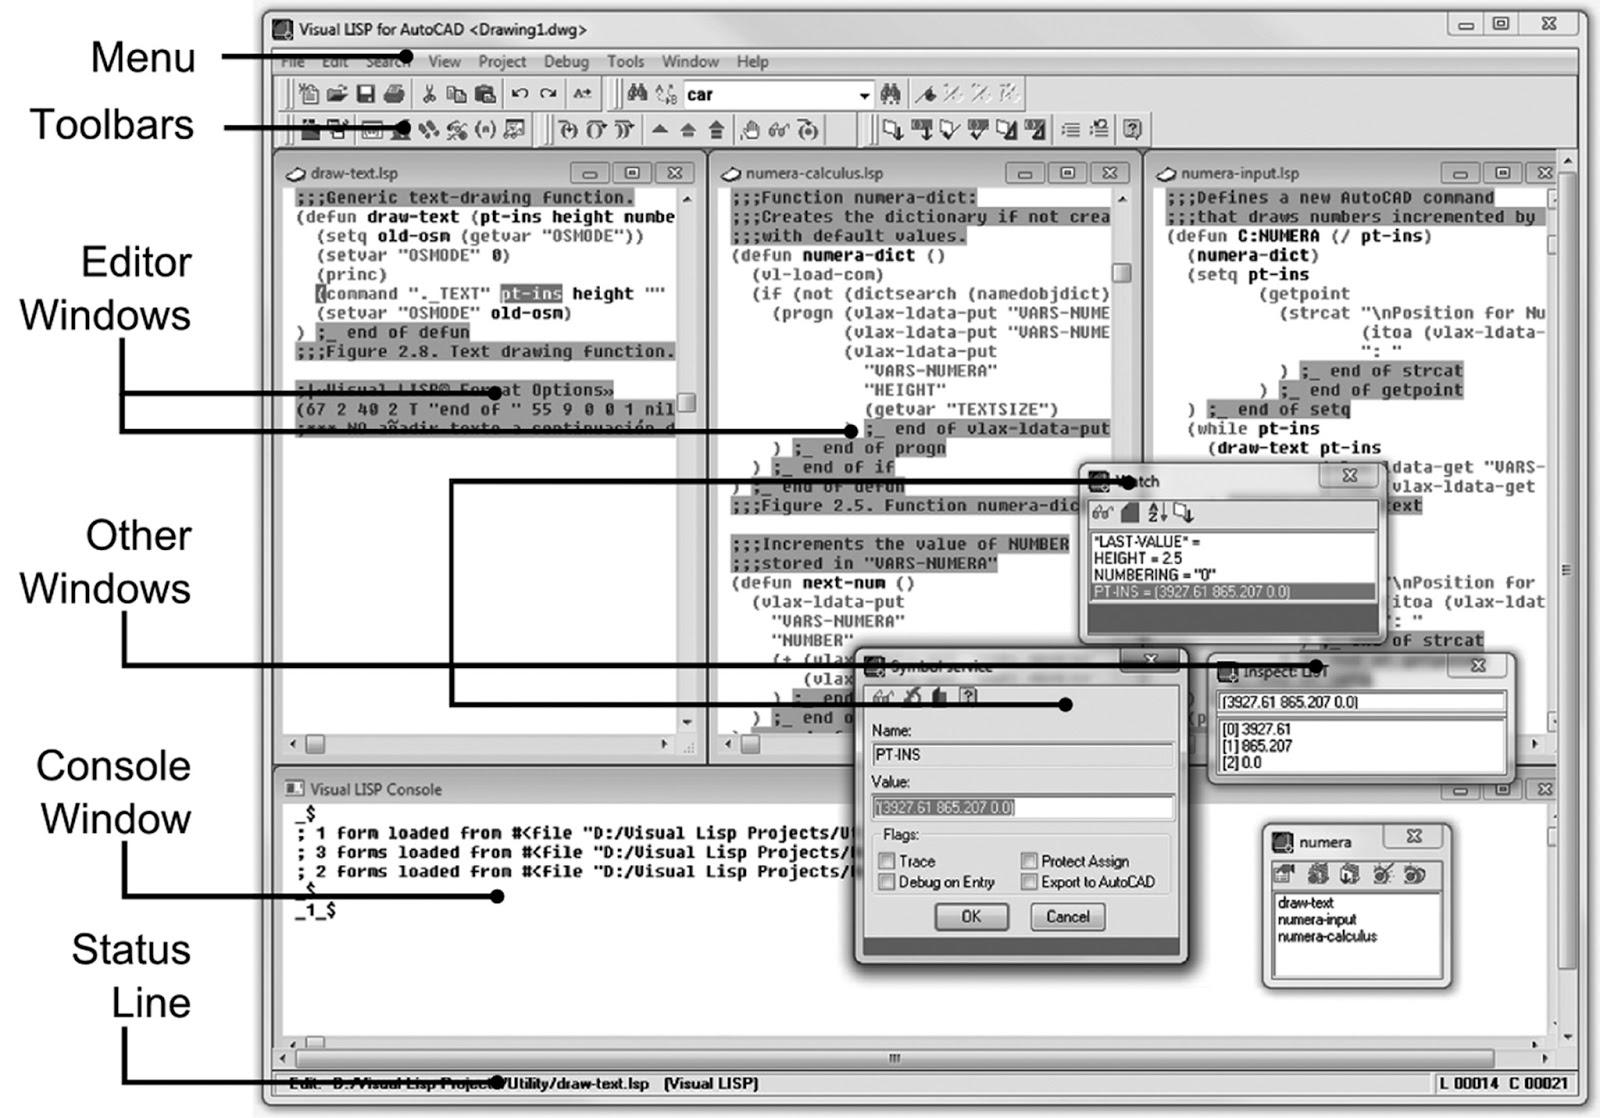 AutoCAD expert's Visual LISP: Chapters 3, 4 and 5  Using AutoLISP